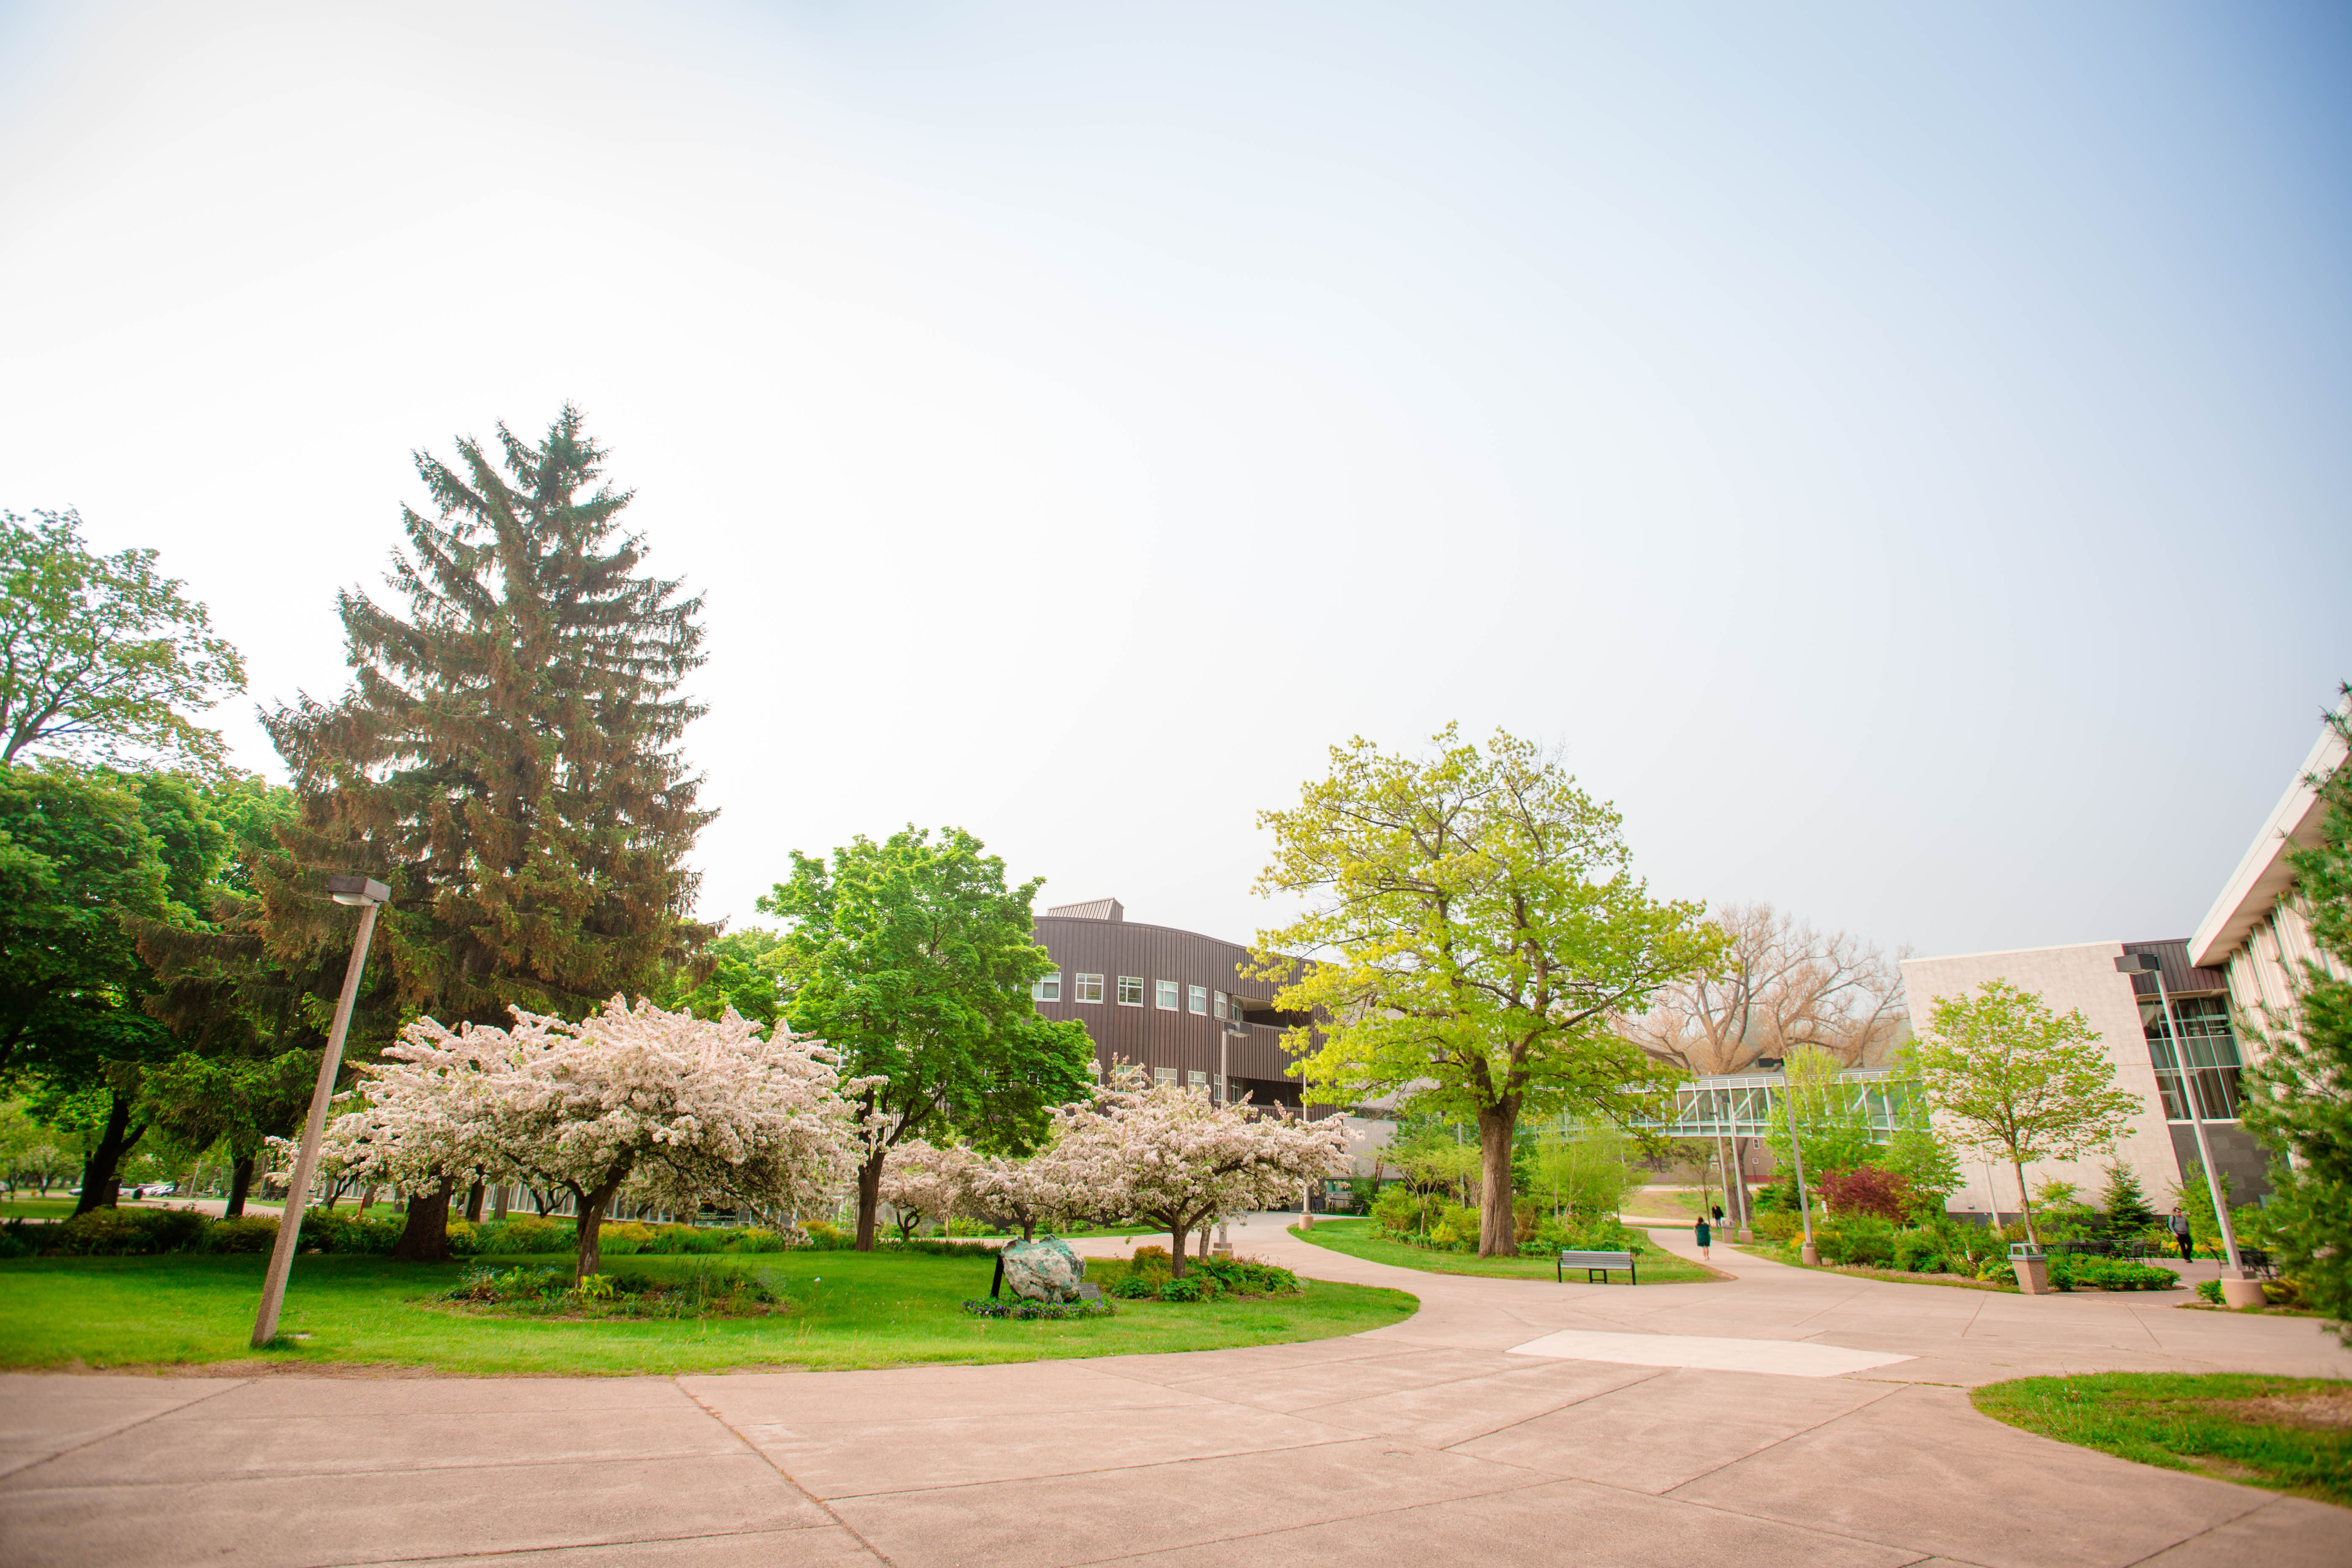 Foggy Morning Campus 201706050103